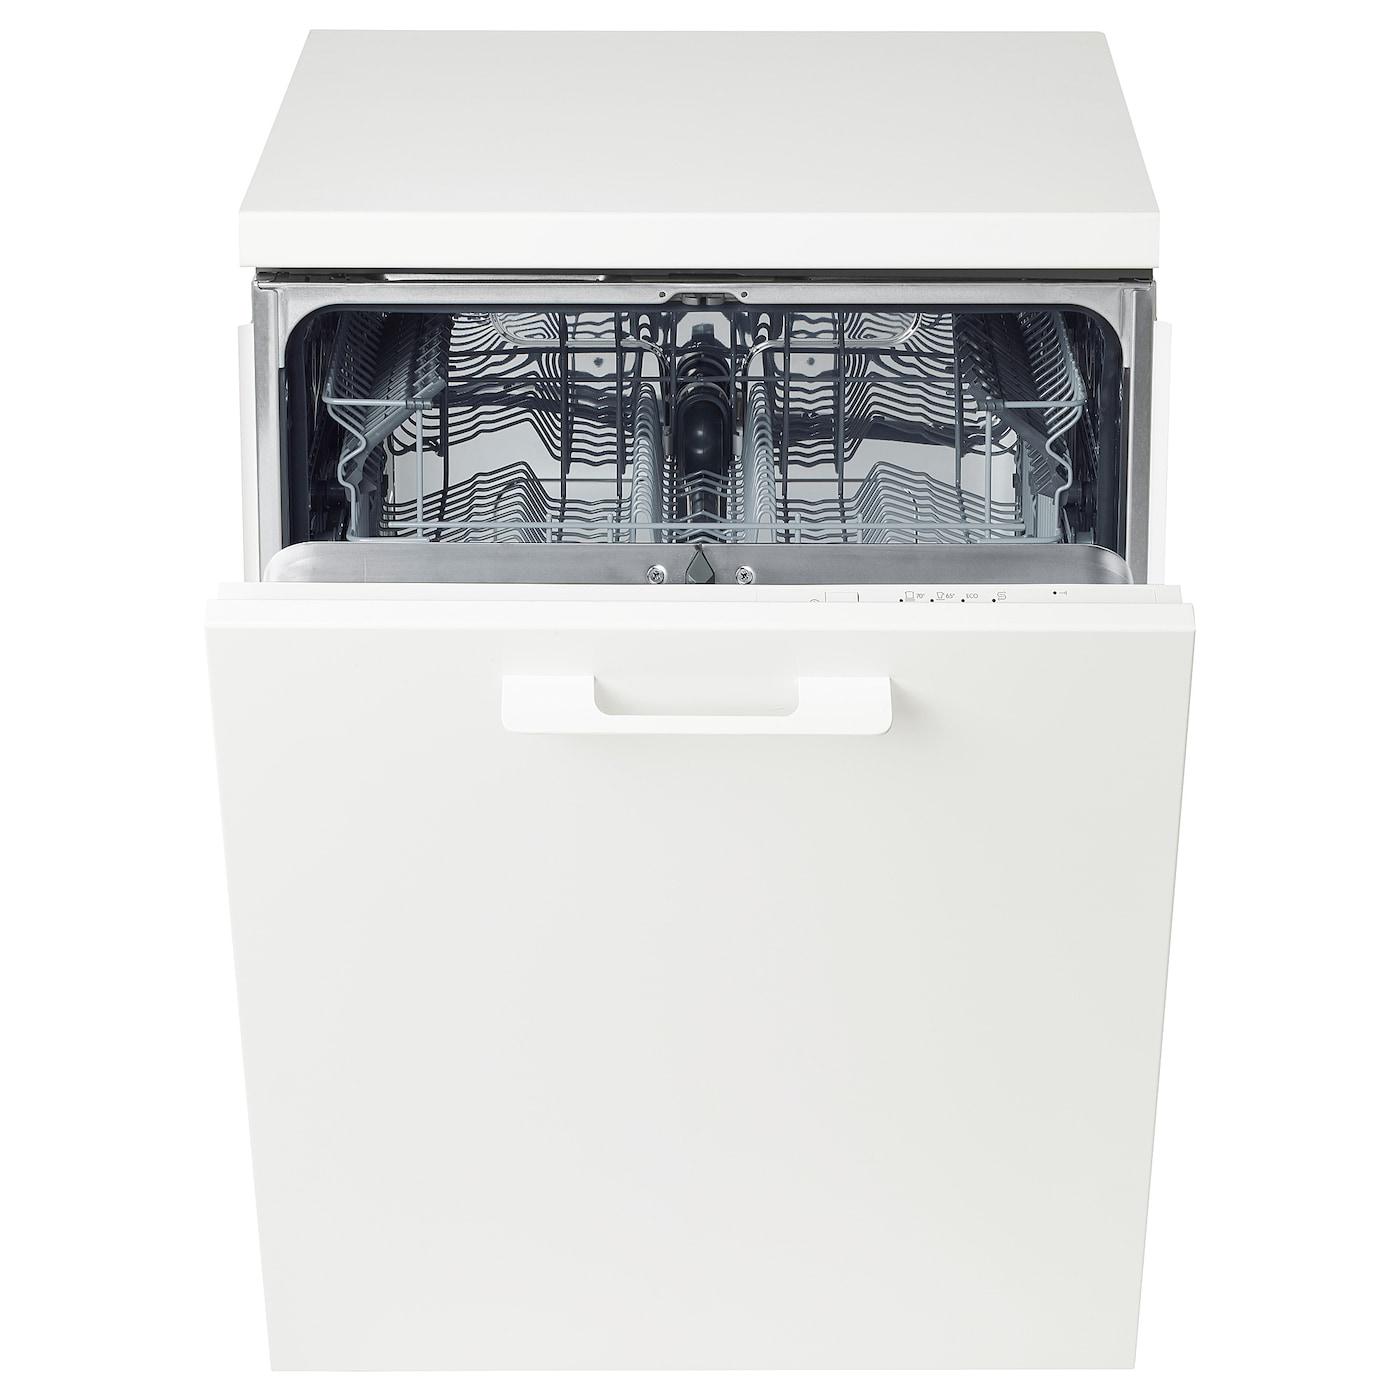 Electrom nager appareils cuisine ikea - Lave vaisselle encastrable ikea metod ...